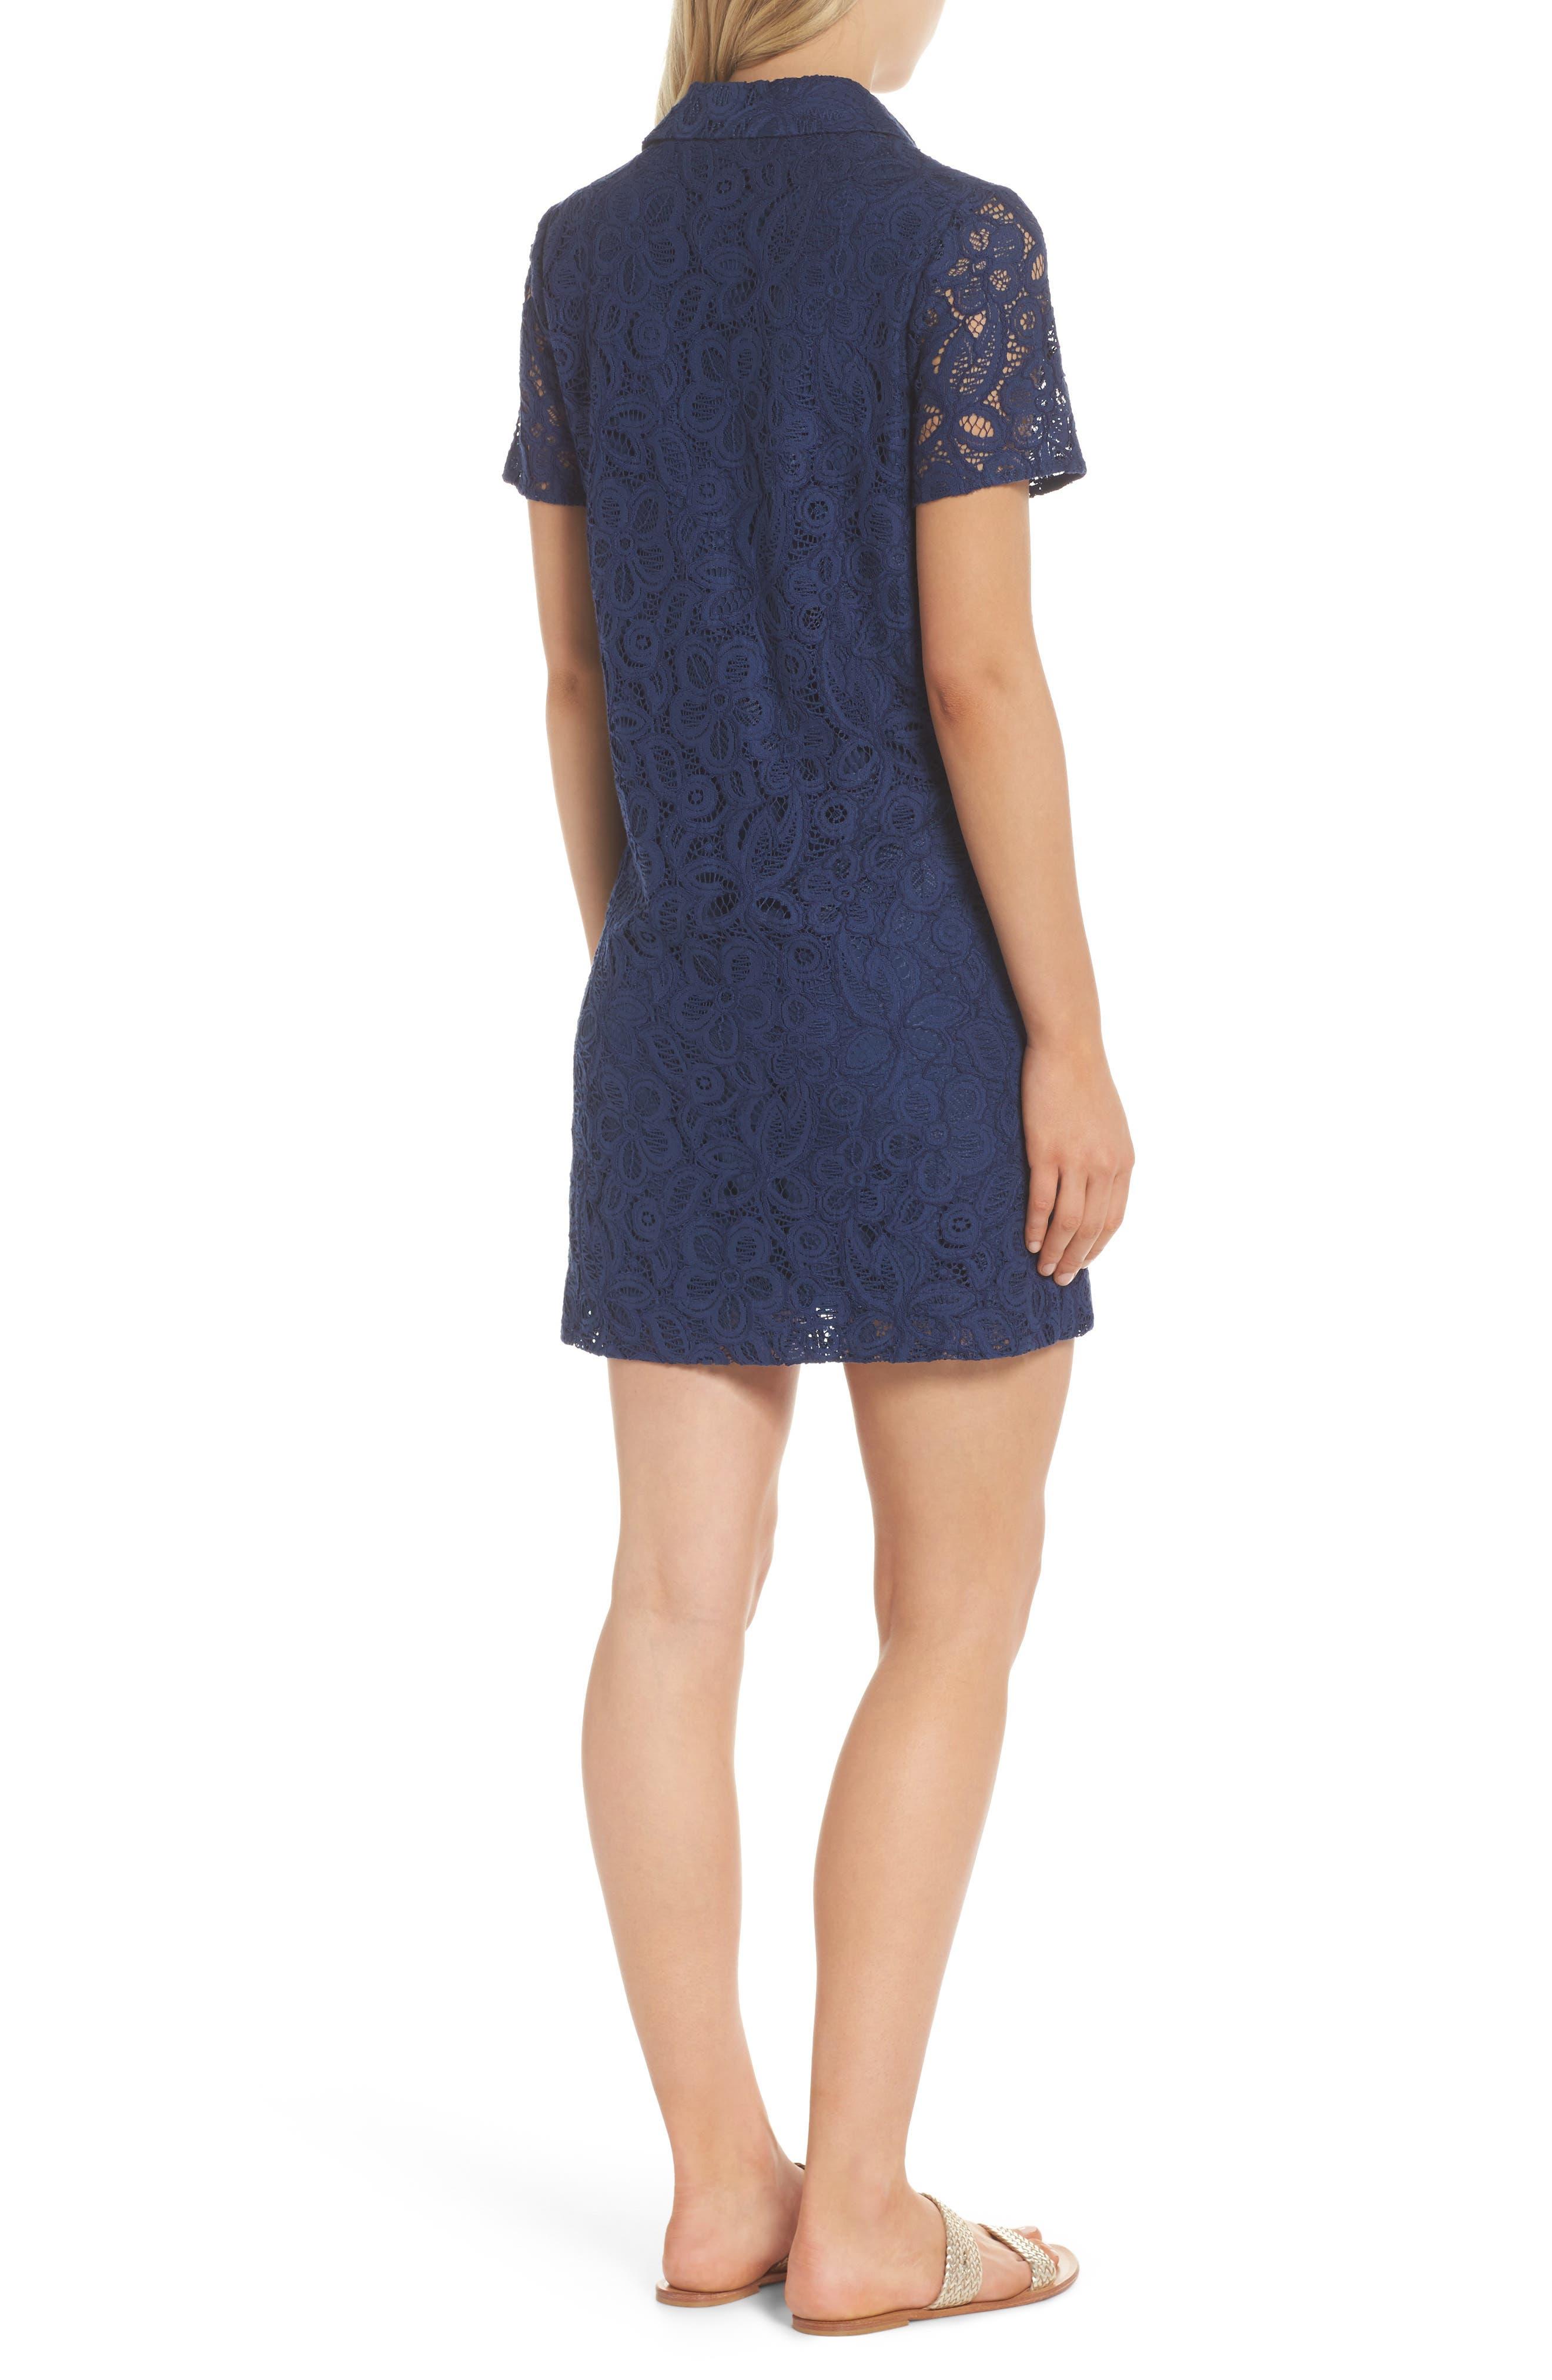 Nelle Shirtdress,                             Alternate thumbnail 2, color,                             High Tide Floral Pop Lace